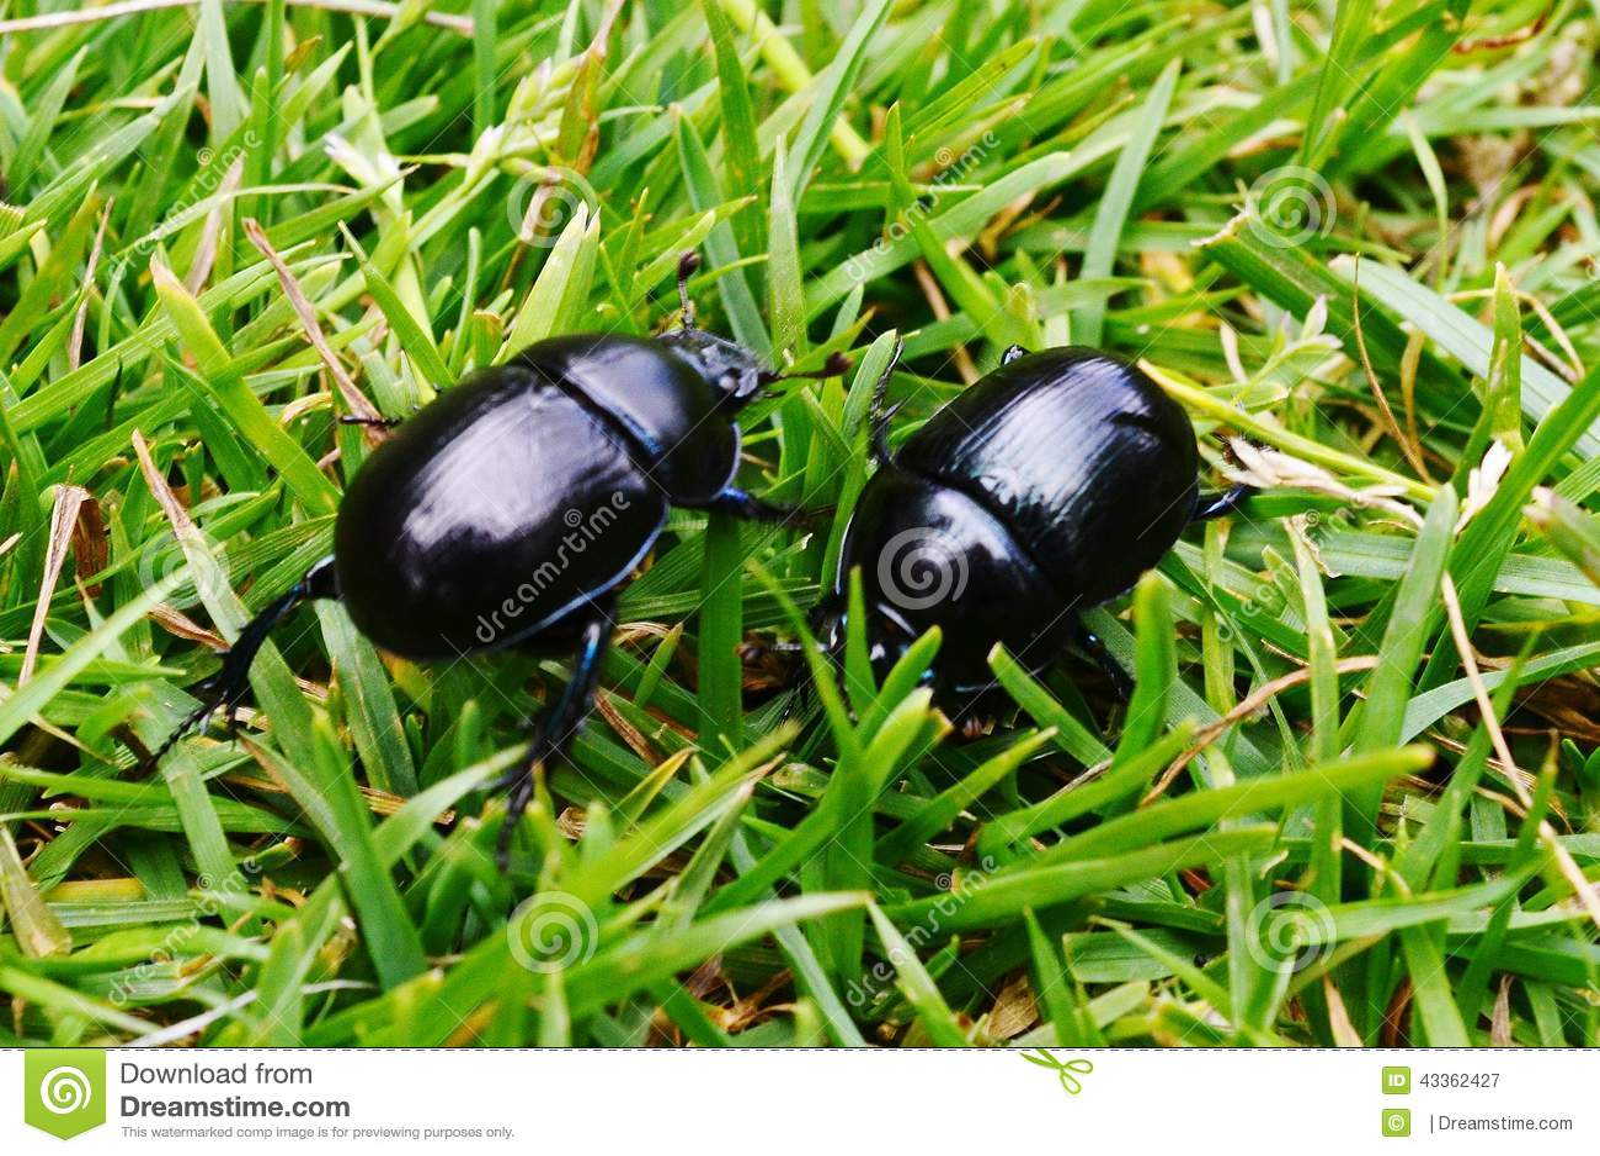 Kevers in het Gras